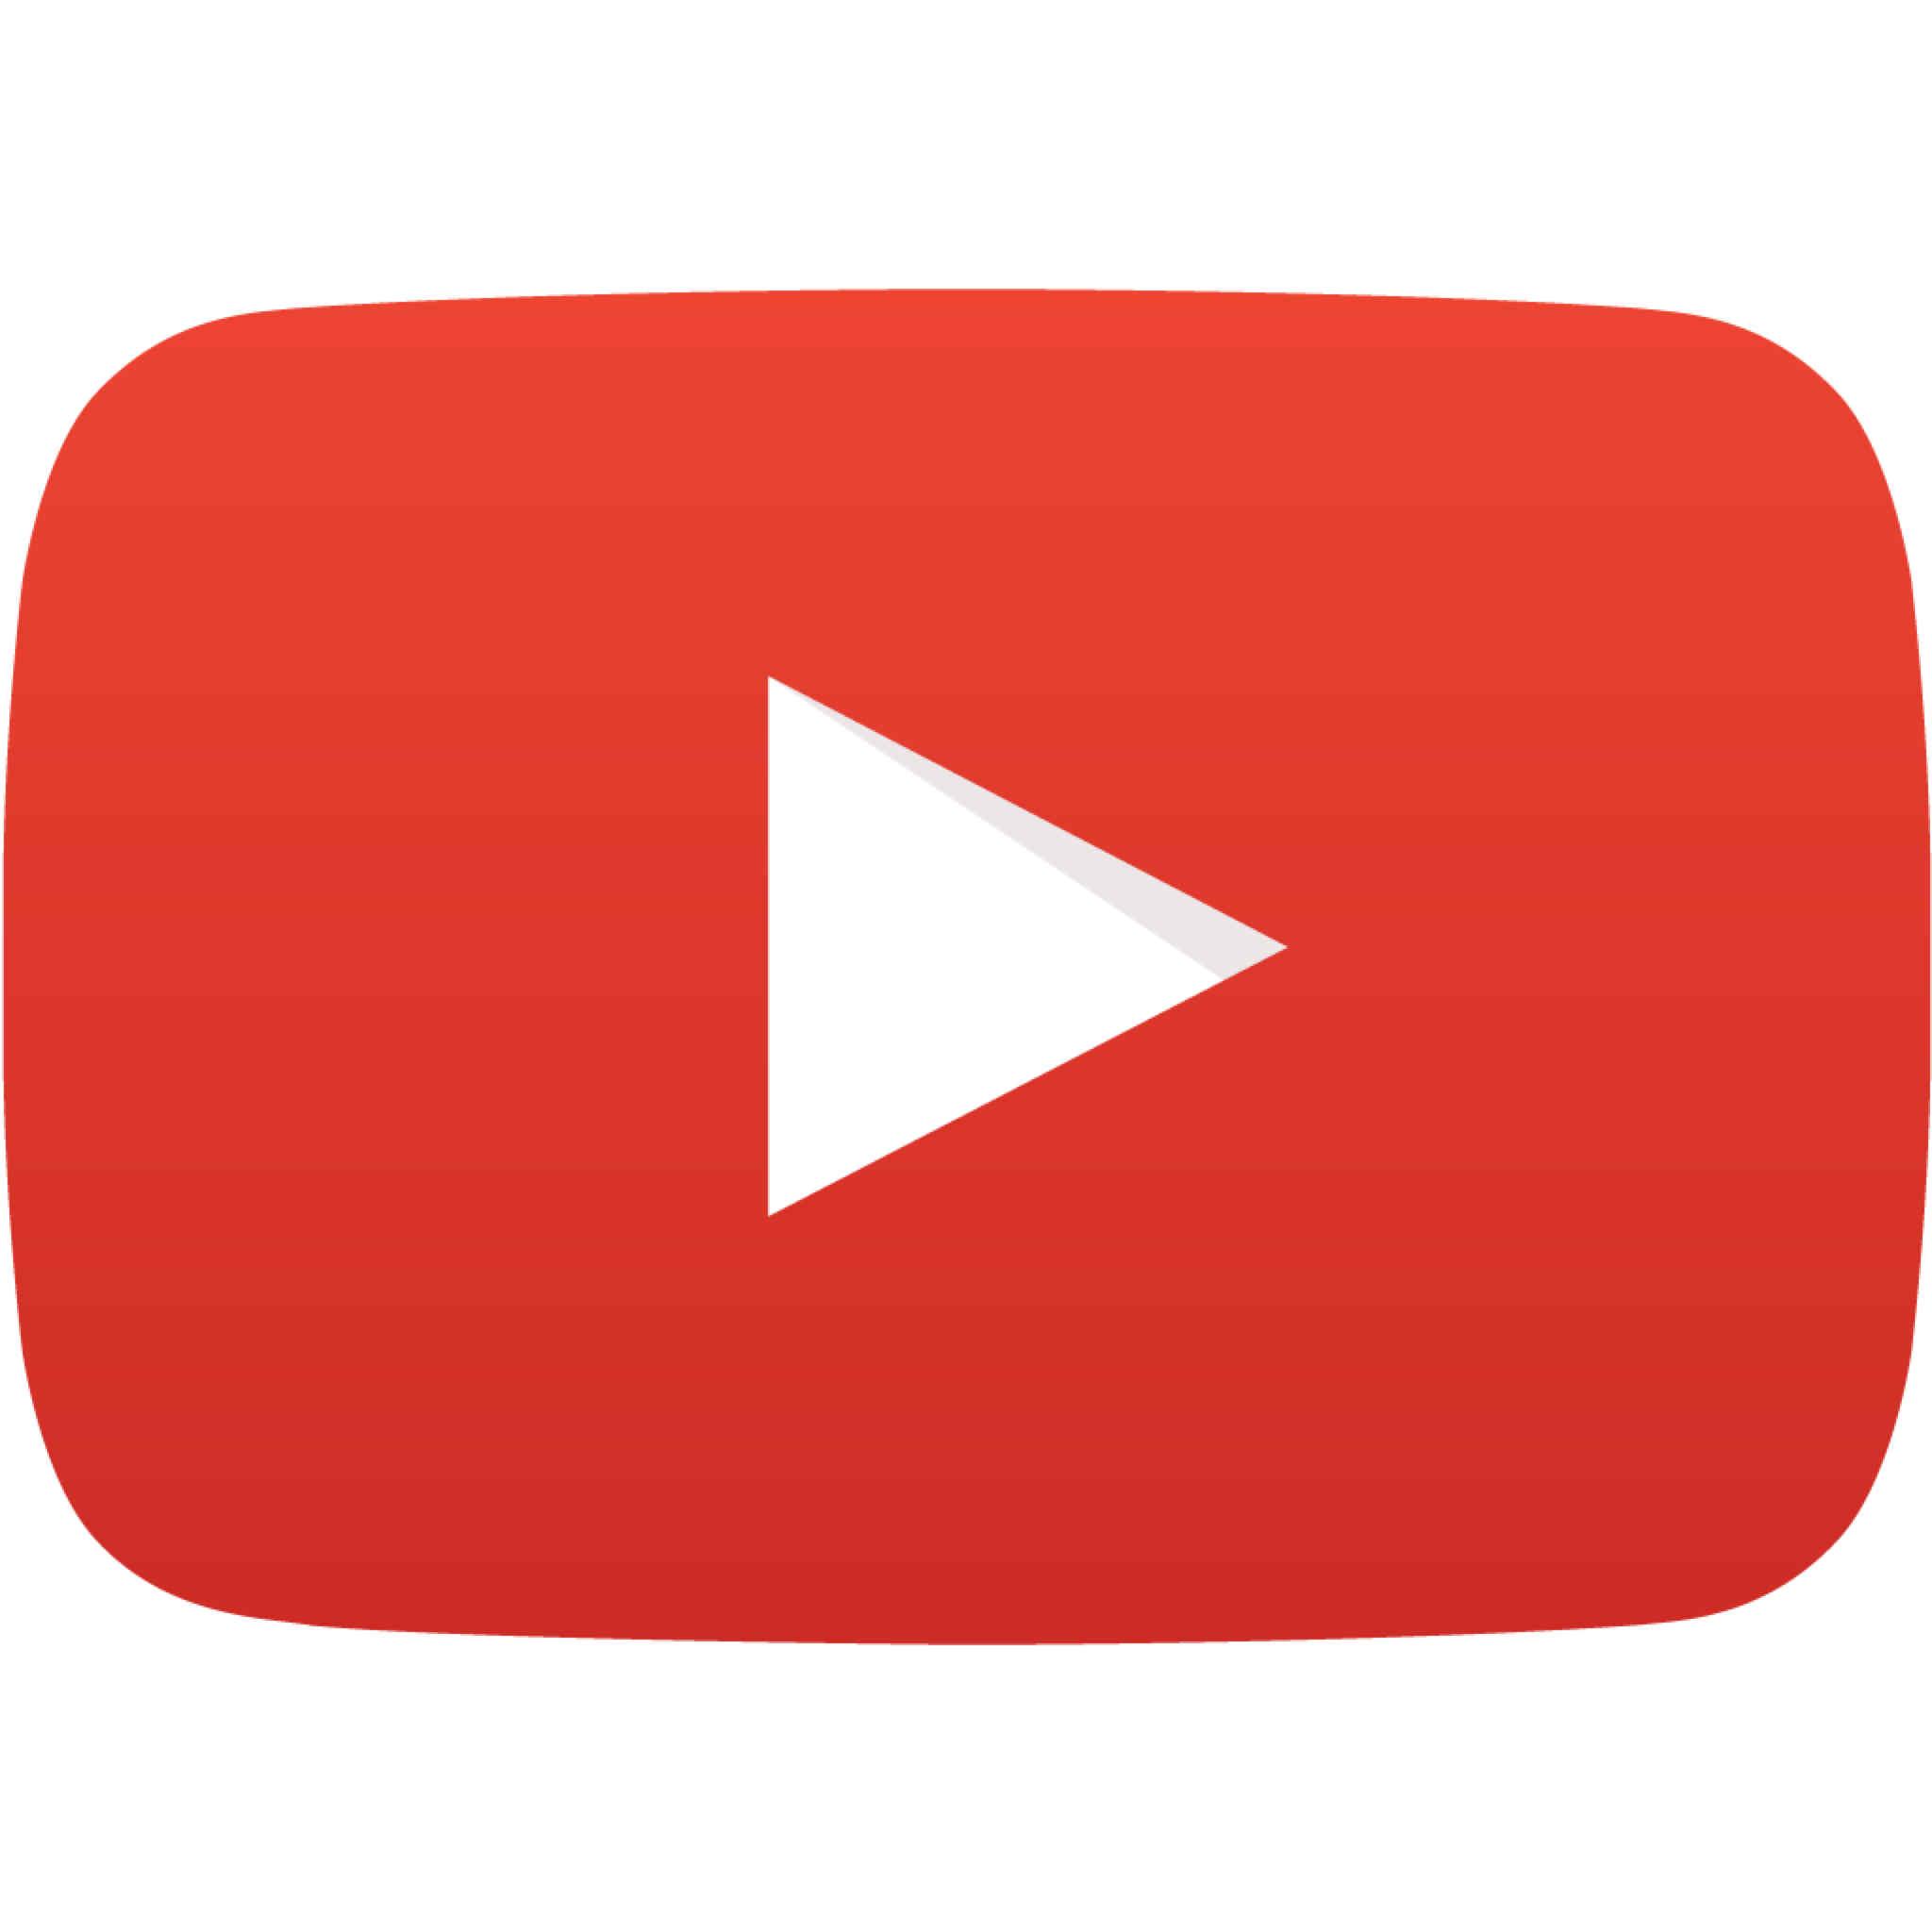 YouTube Creator Studio in arrivo anche per iOS - Macitynet it